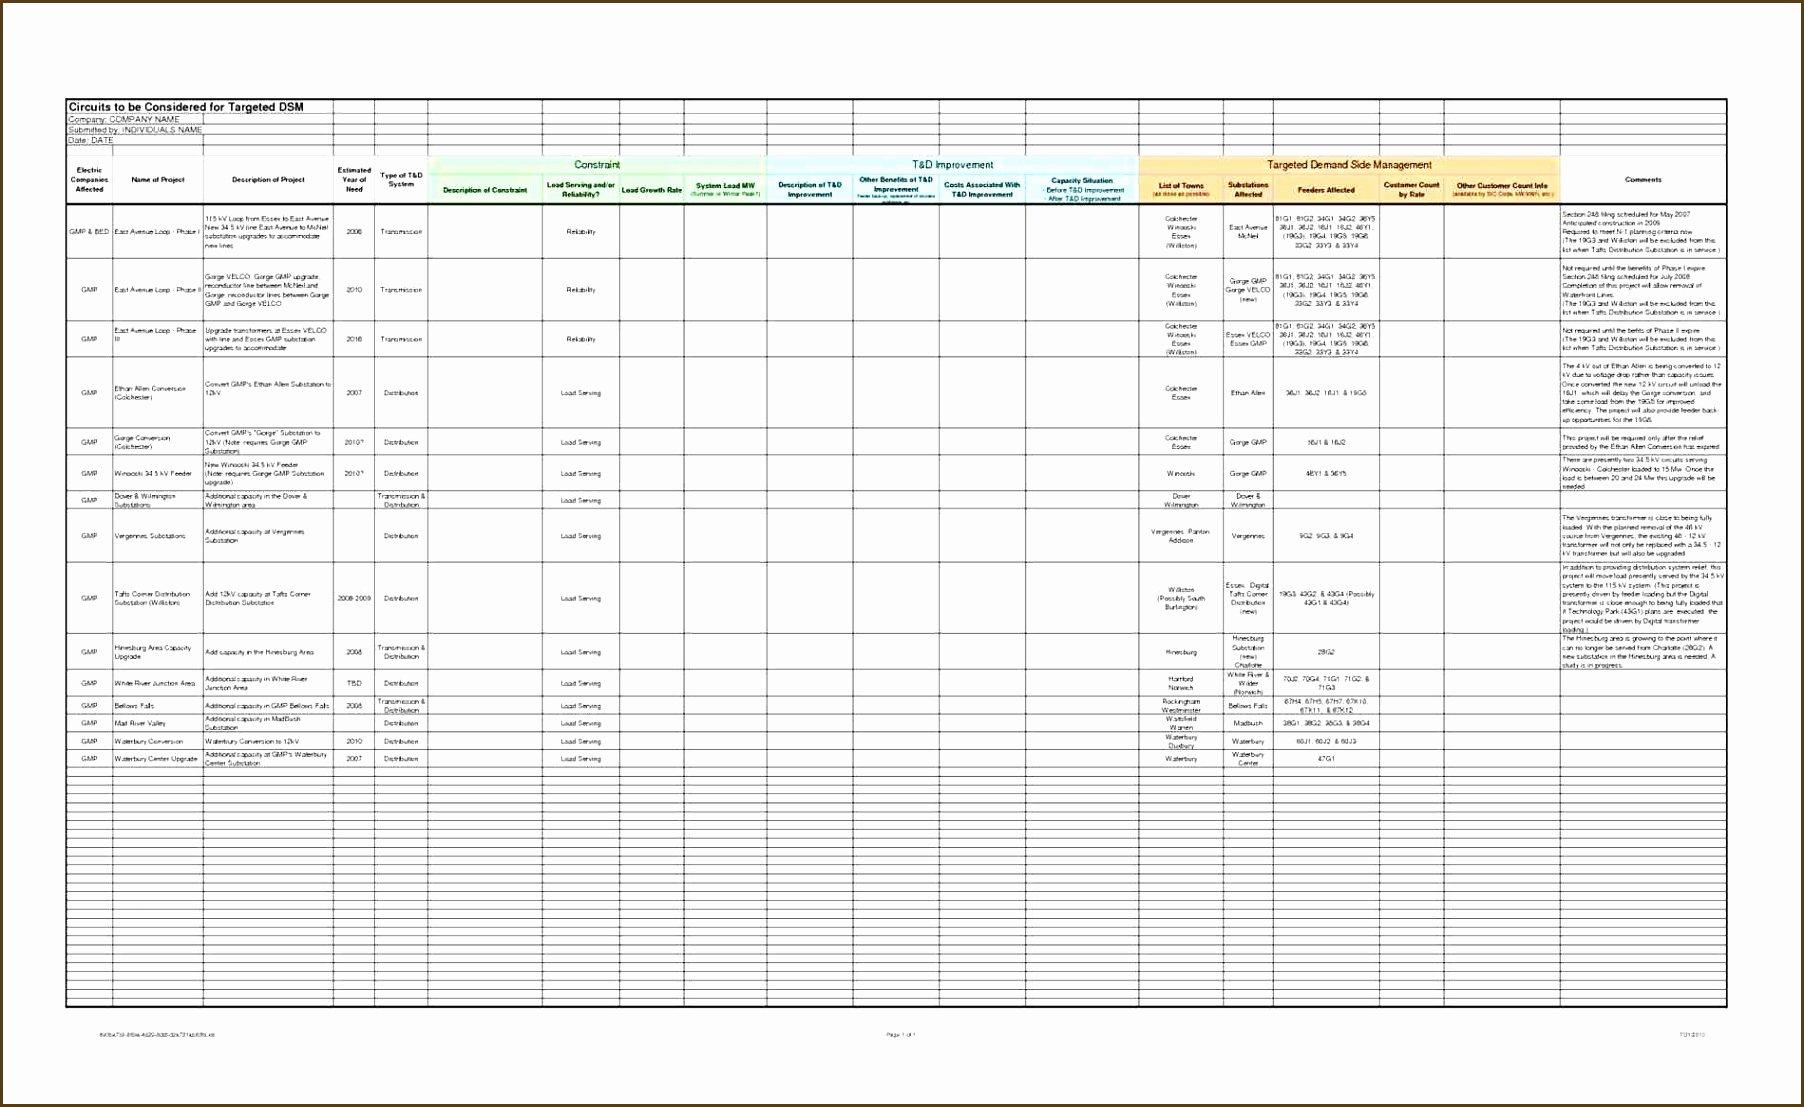 Construction Draw Schedule Template Elegant 16 Construction Draw Schedule Template